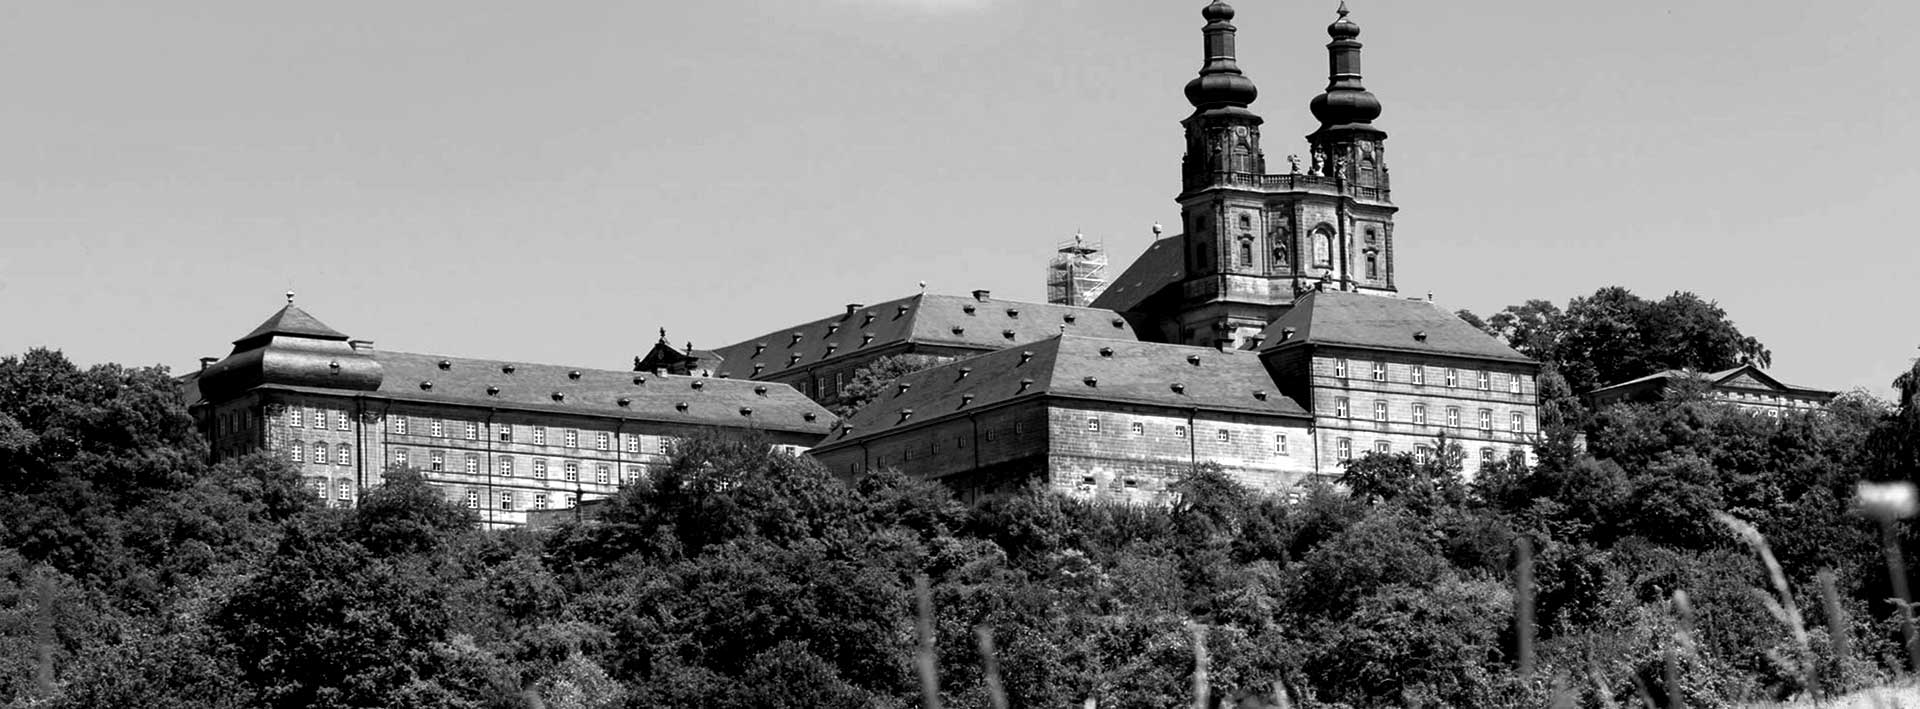 Tajemnice klasztoru Banz